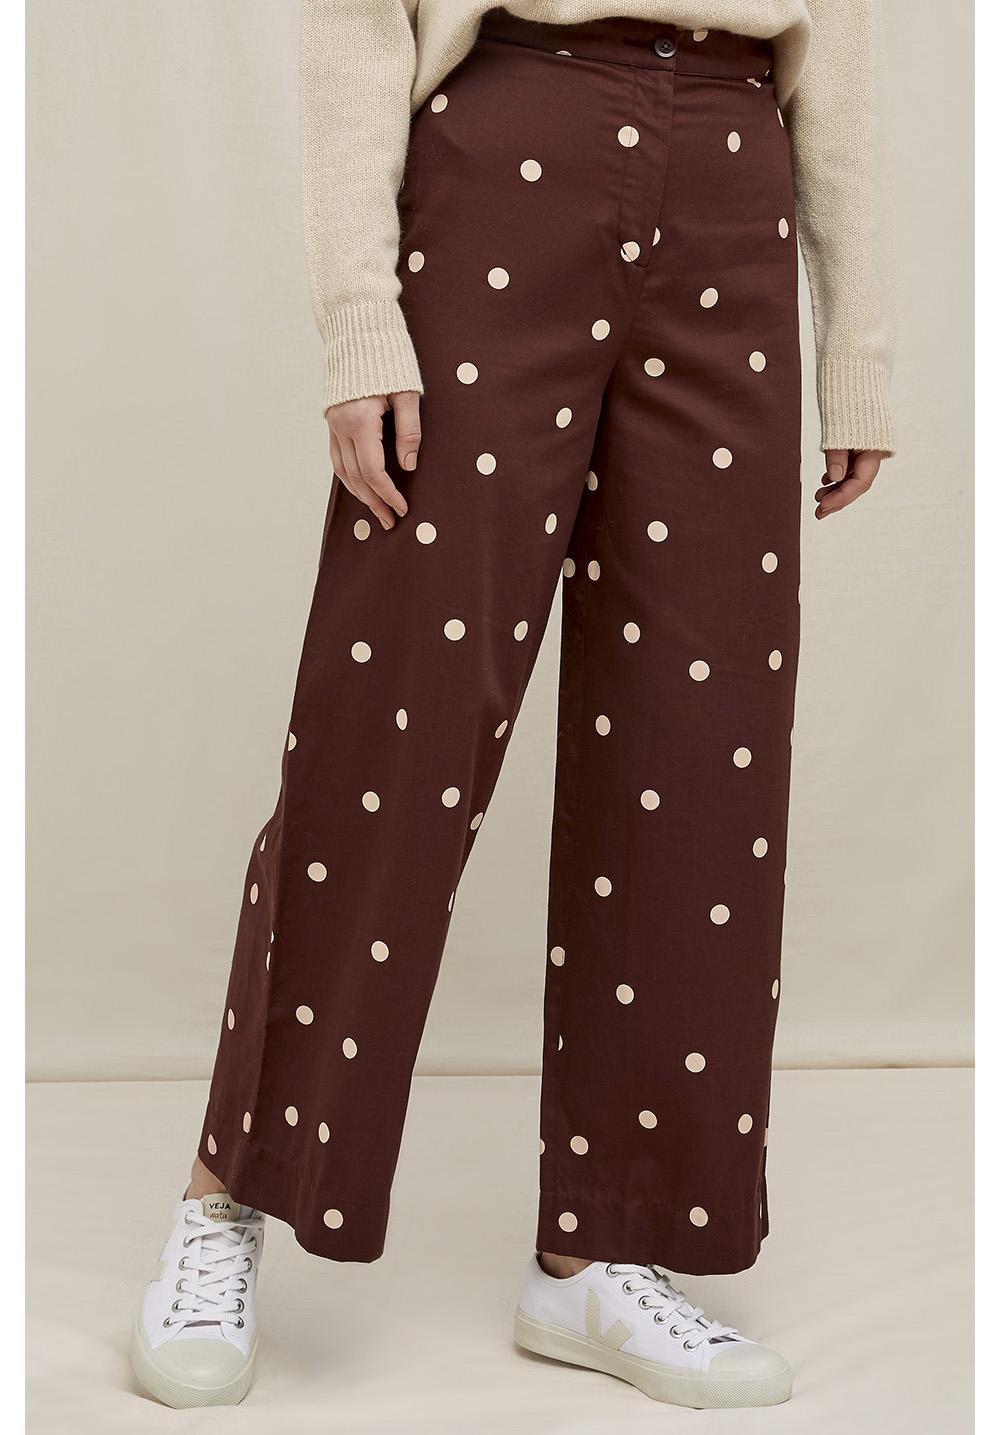 Ailsa Polka Dot Trousers